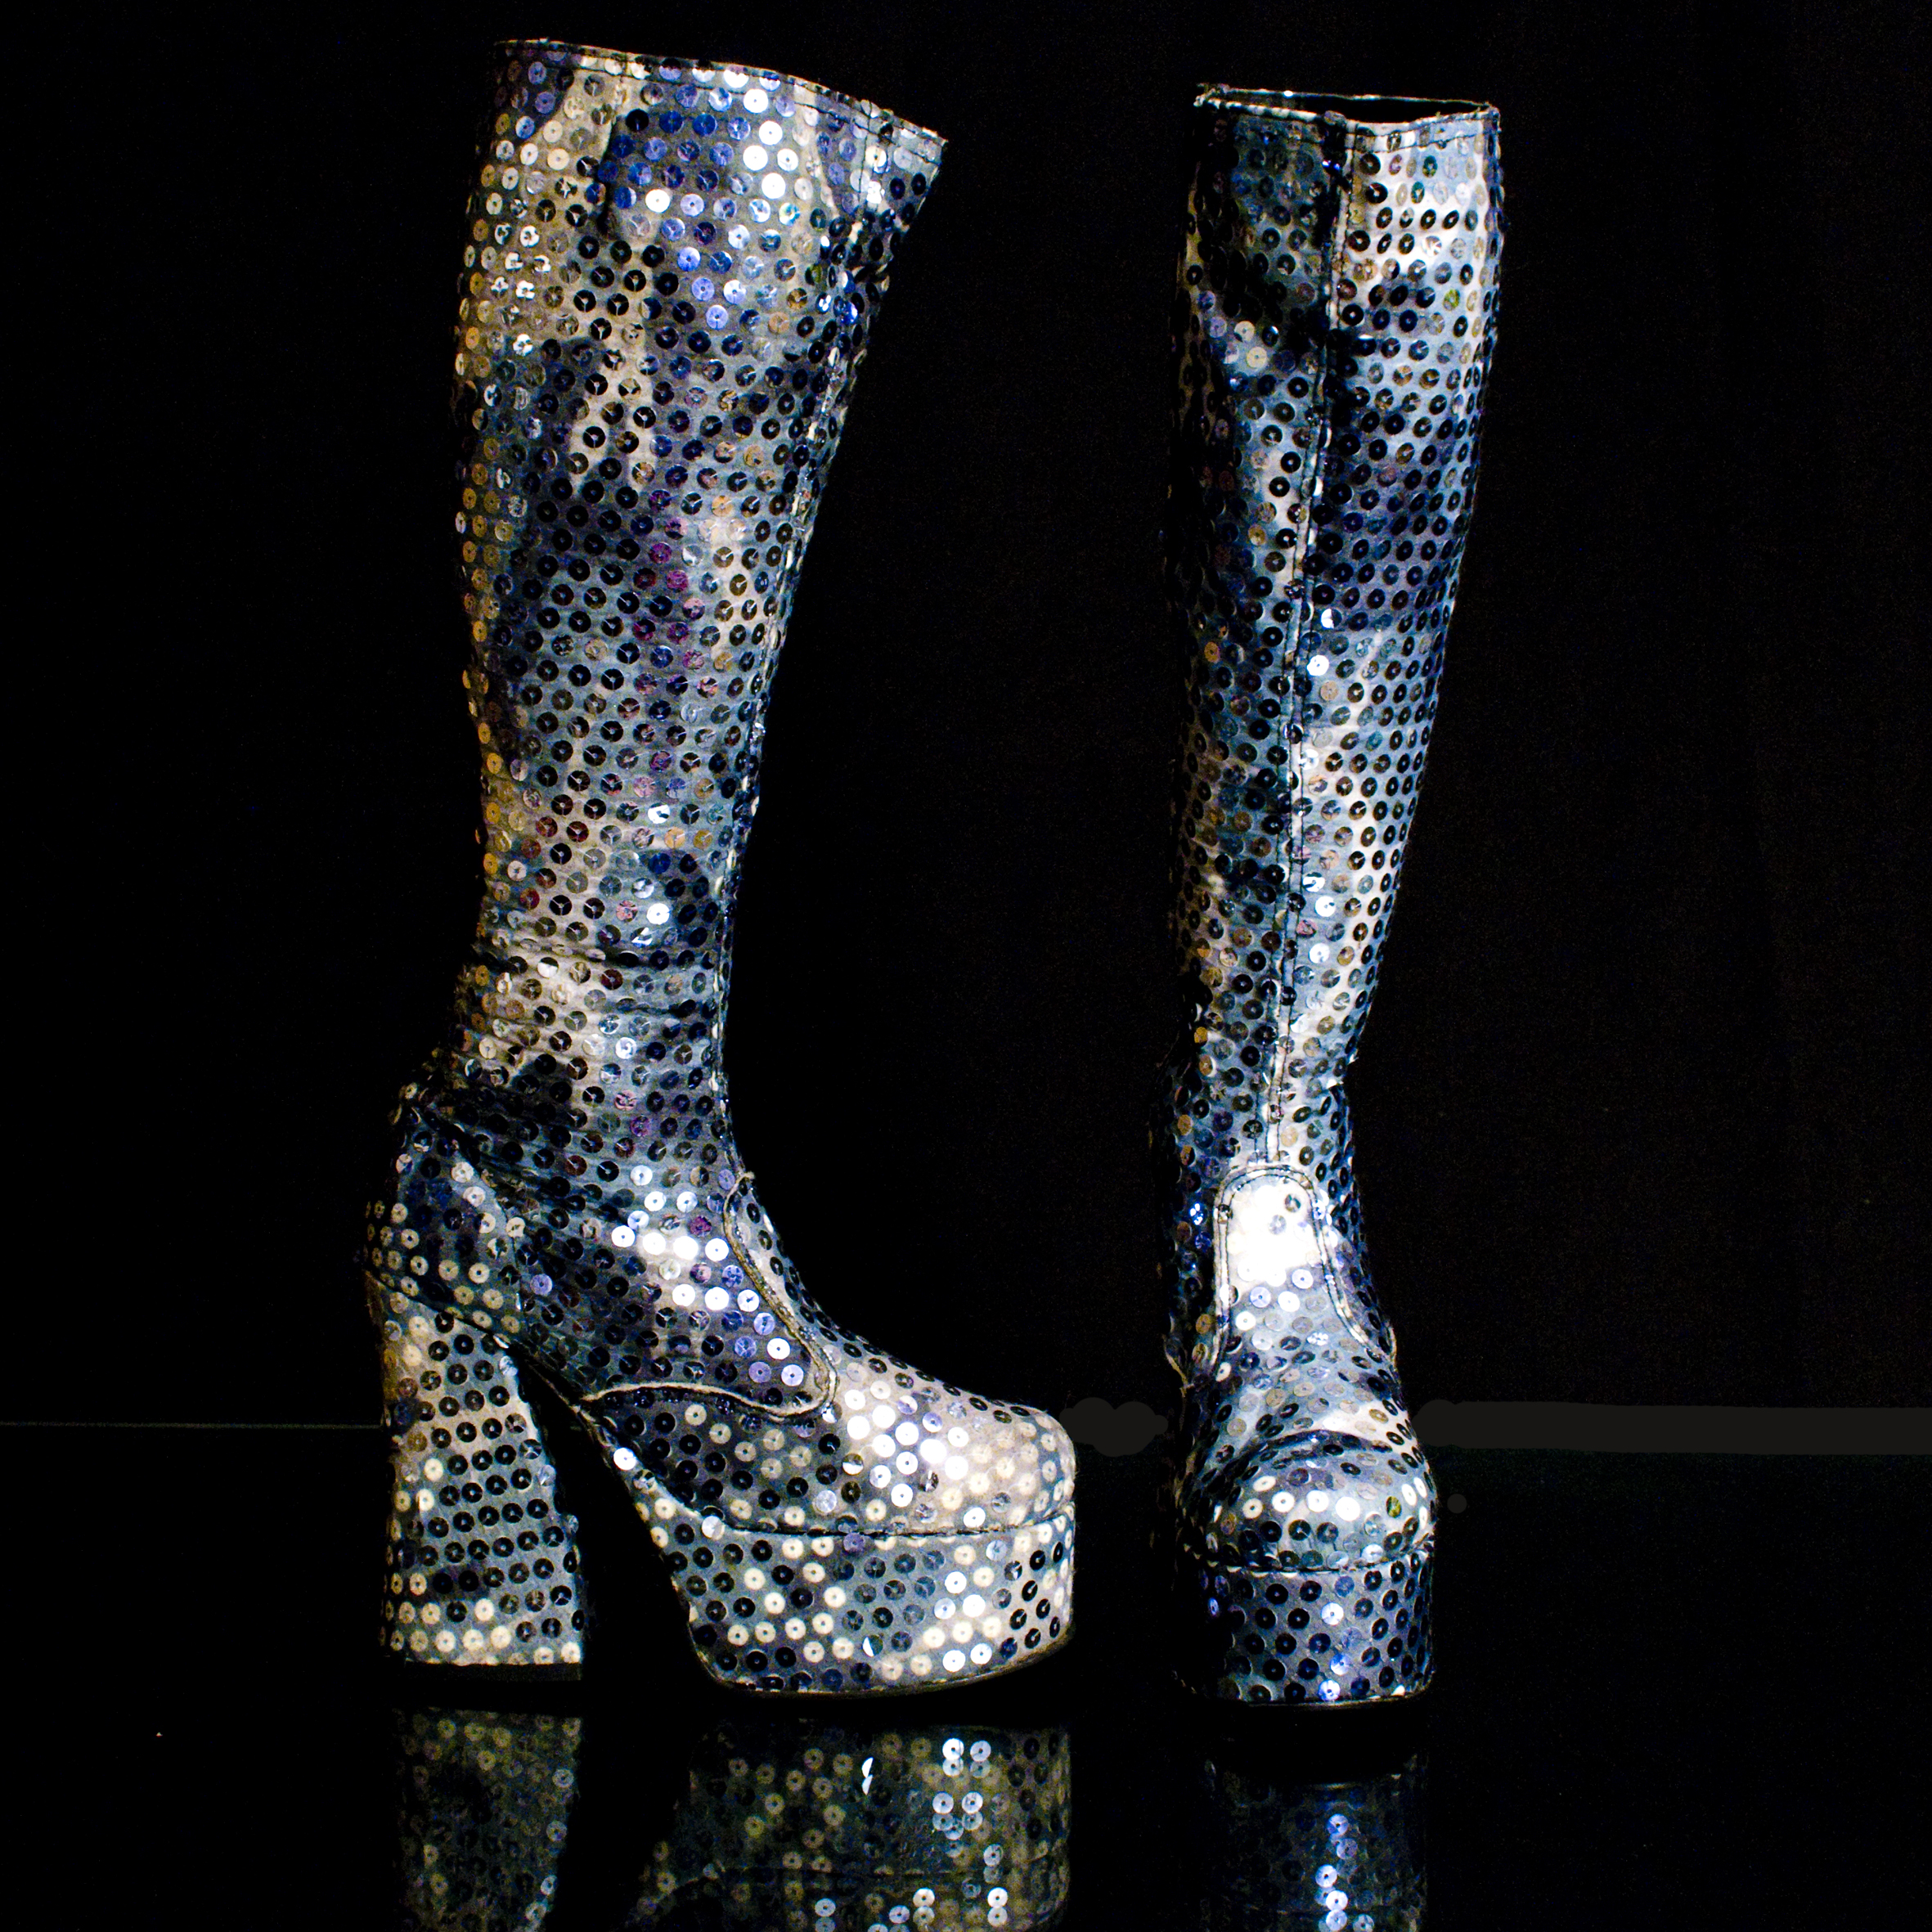 Mel B Sequin Tour Boots 300 HQ.jpg